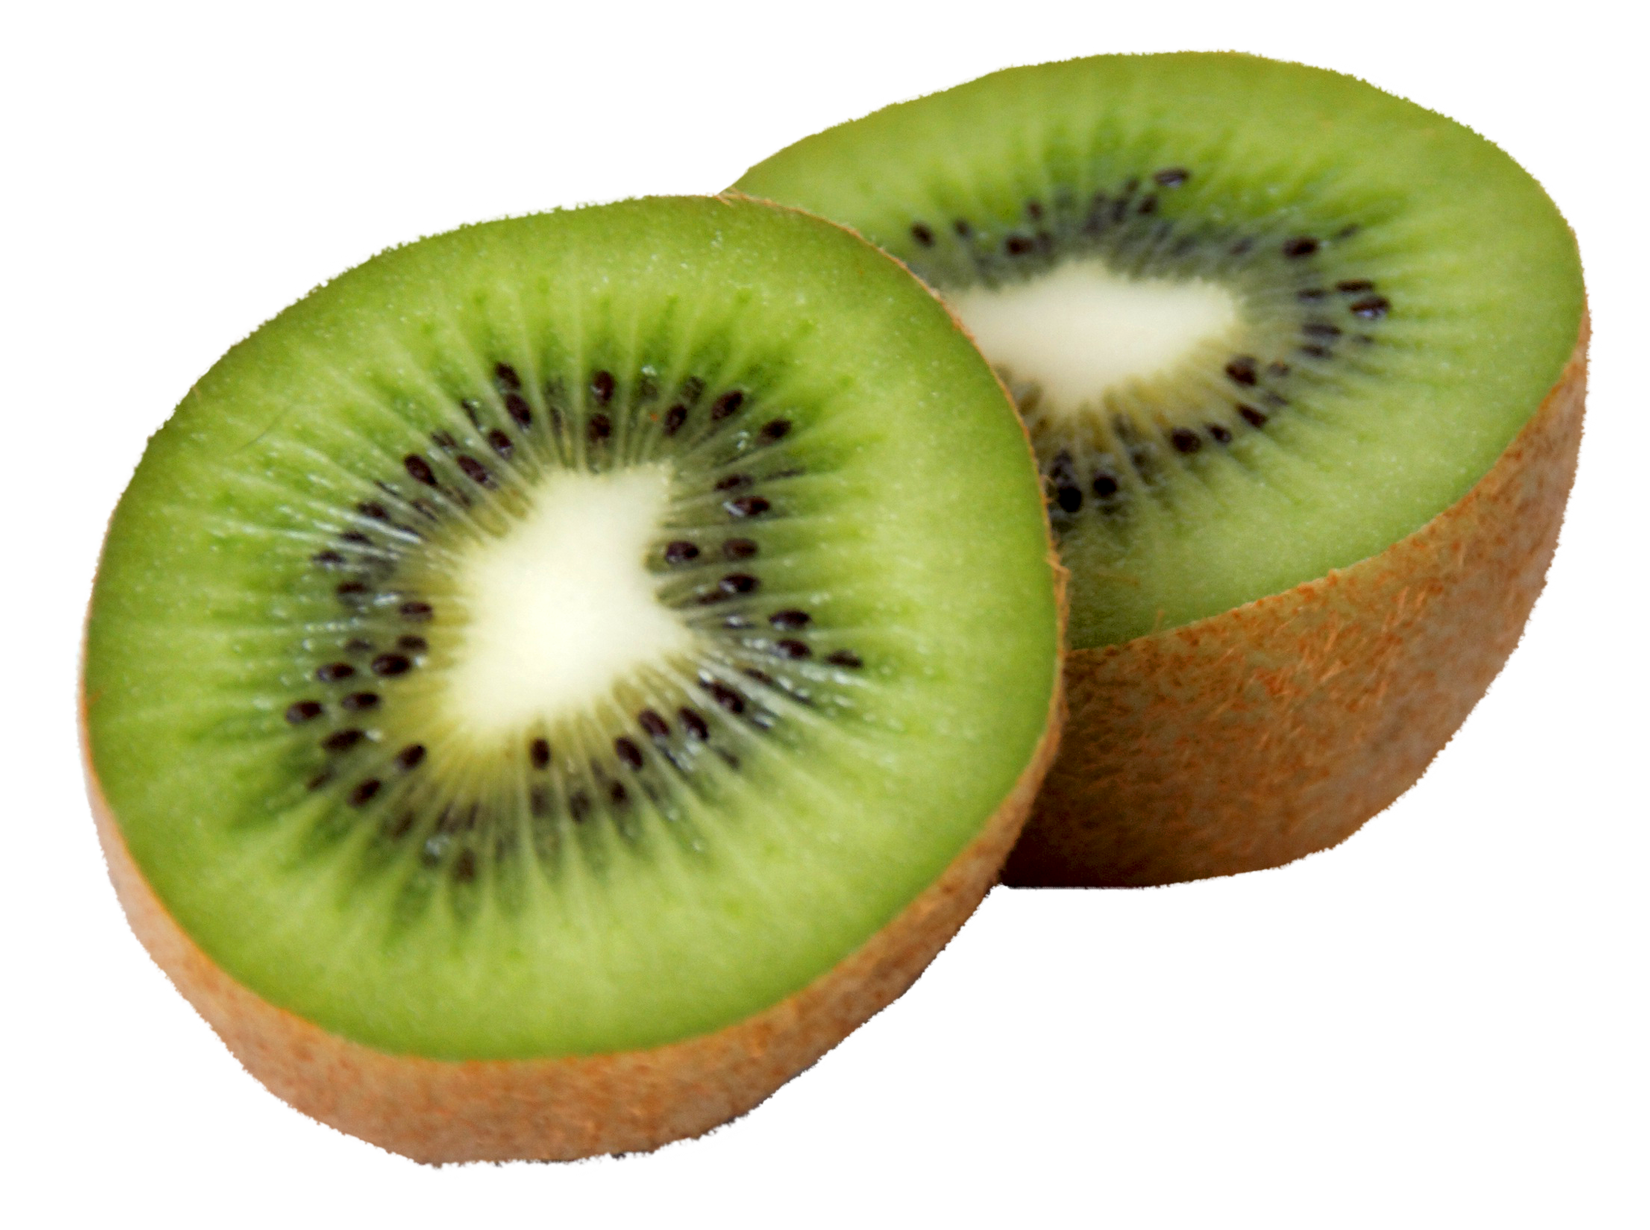 Kiwi Fruit PNG Image - Kiwi PNG